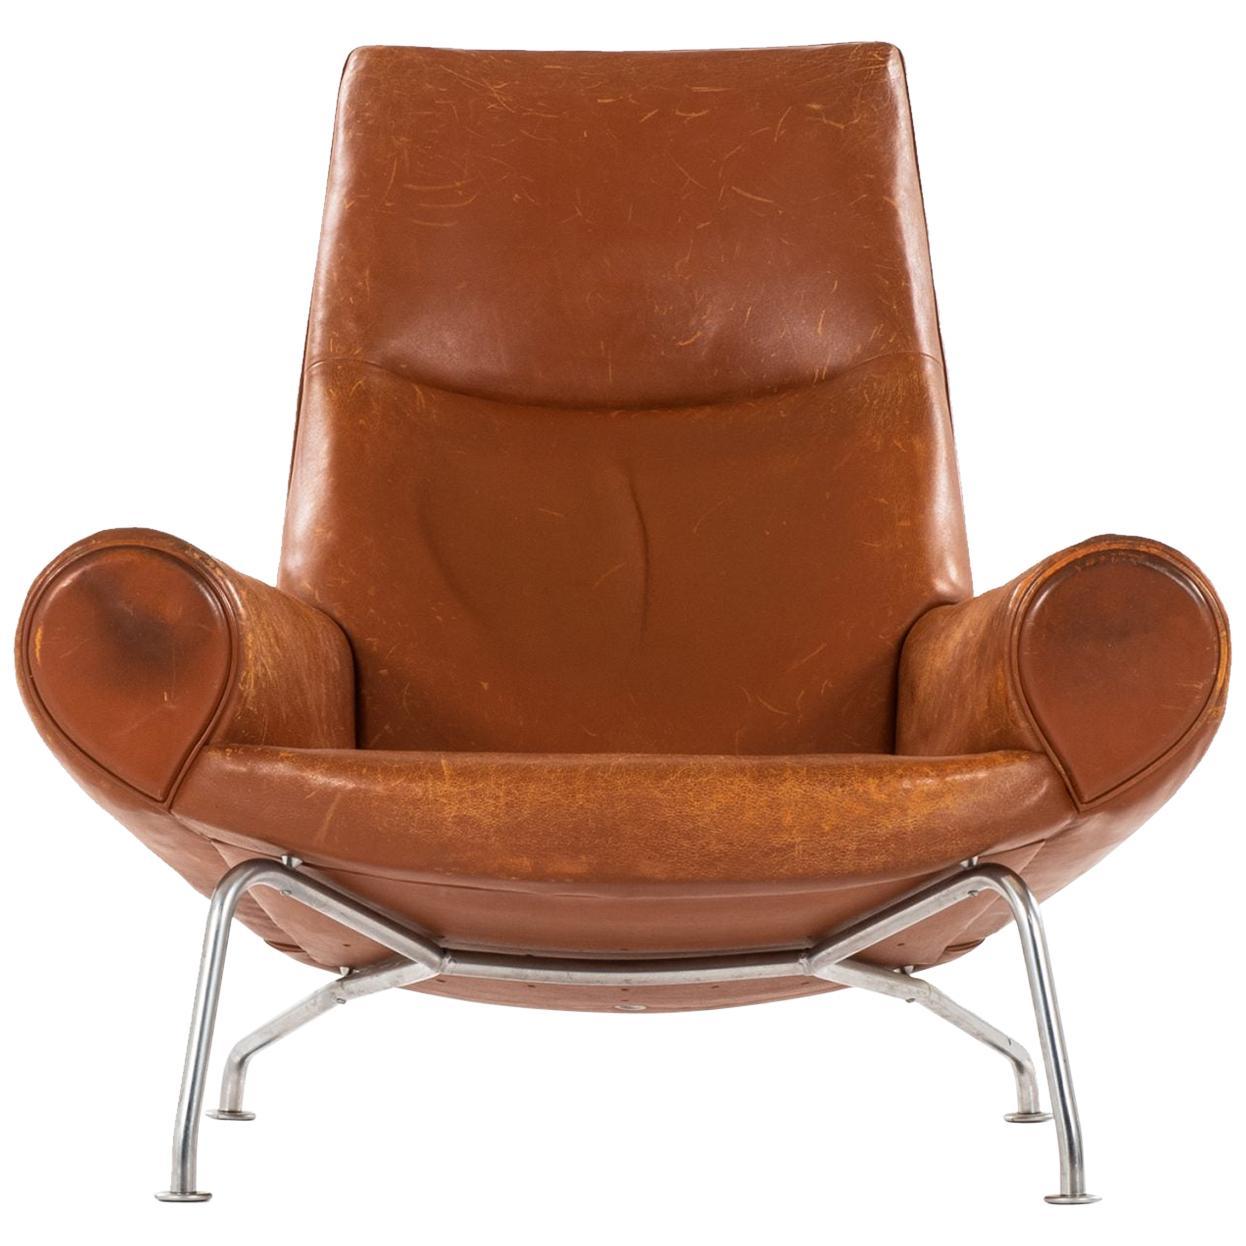 Hans Wegner Easy Chair Model AP47 / Queen OX Chair by A.P. Stolen in Denmark